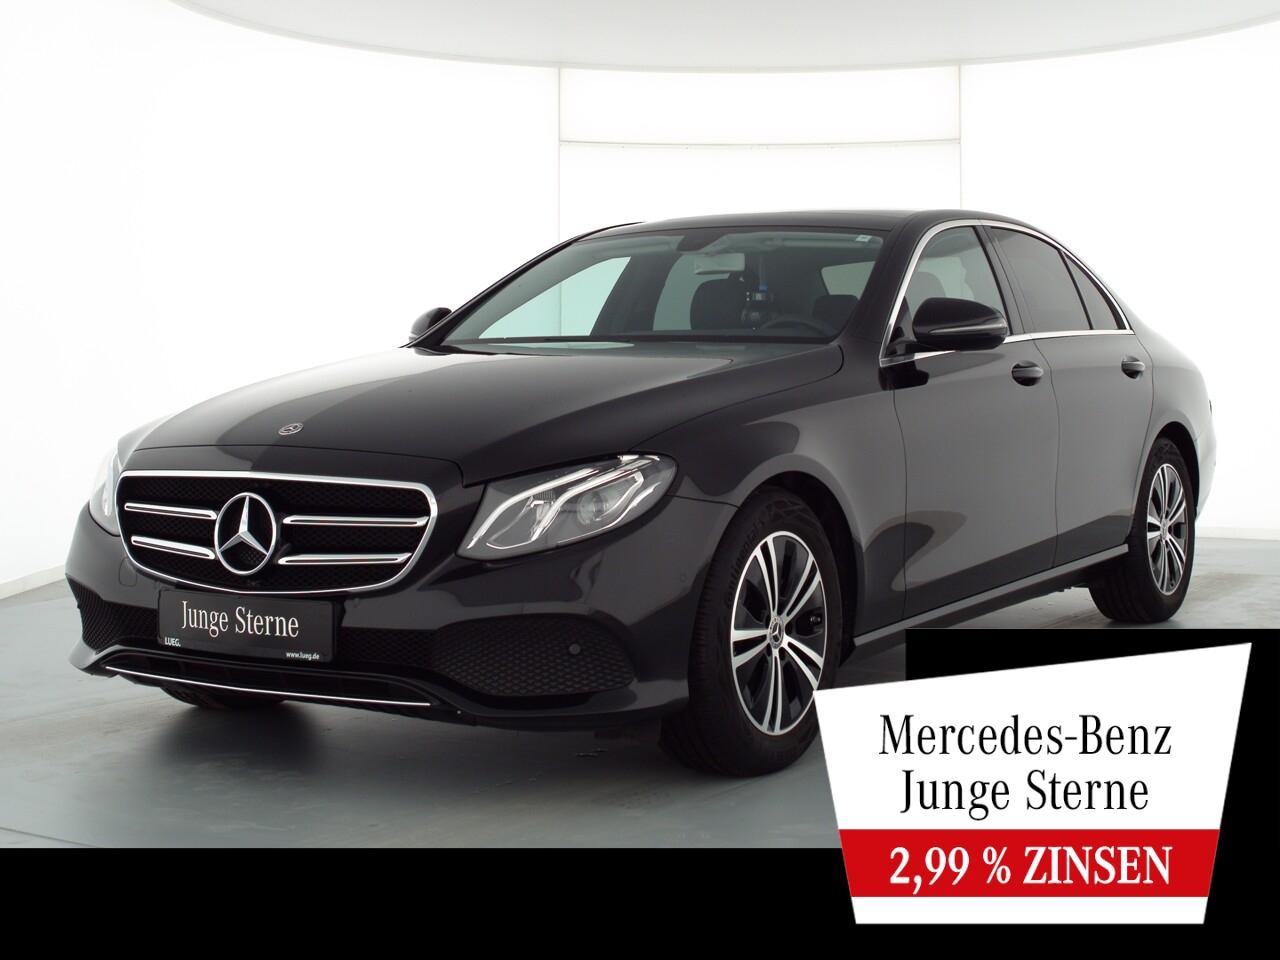 Mercedes-Benz E 220 d Avantgarde+Navi+Pano+LED-HP+Totw+Kamera+, Jahr 2019, Diesel